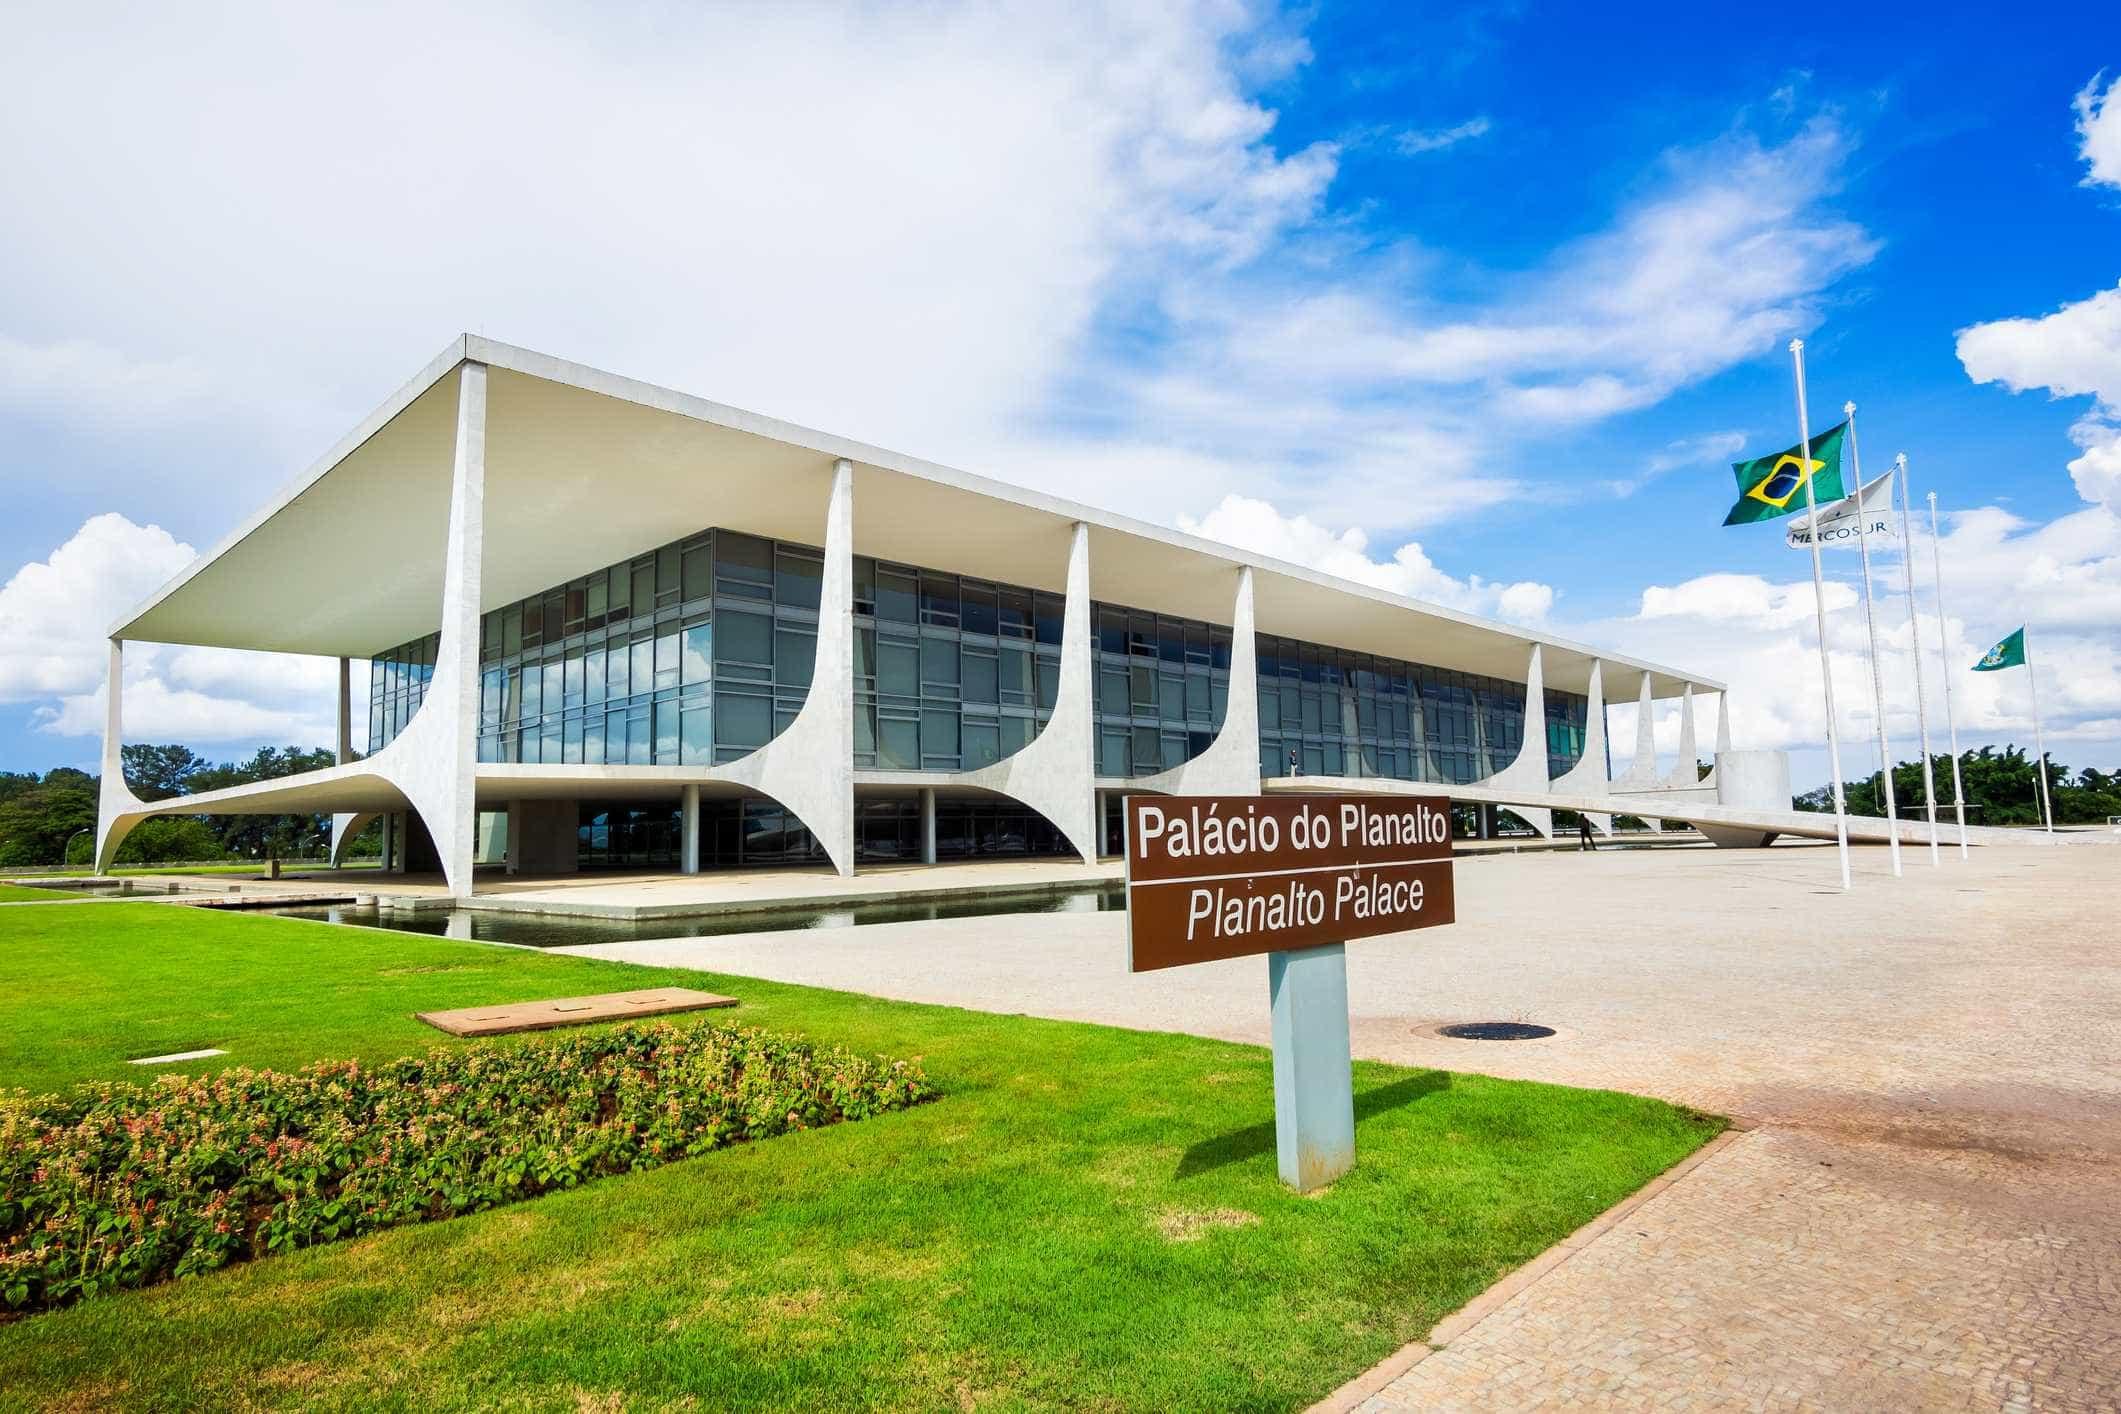 Bolsonaro mina credibilidade com polêmicas, avalia cúpula do Planalto